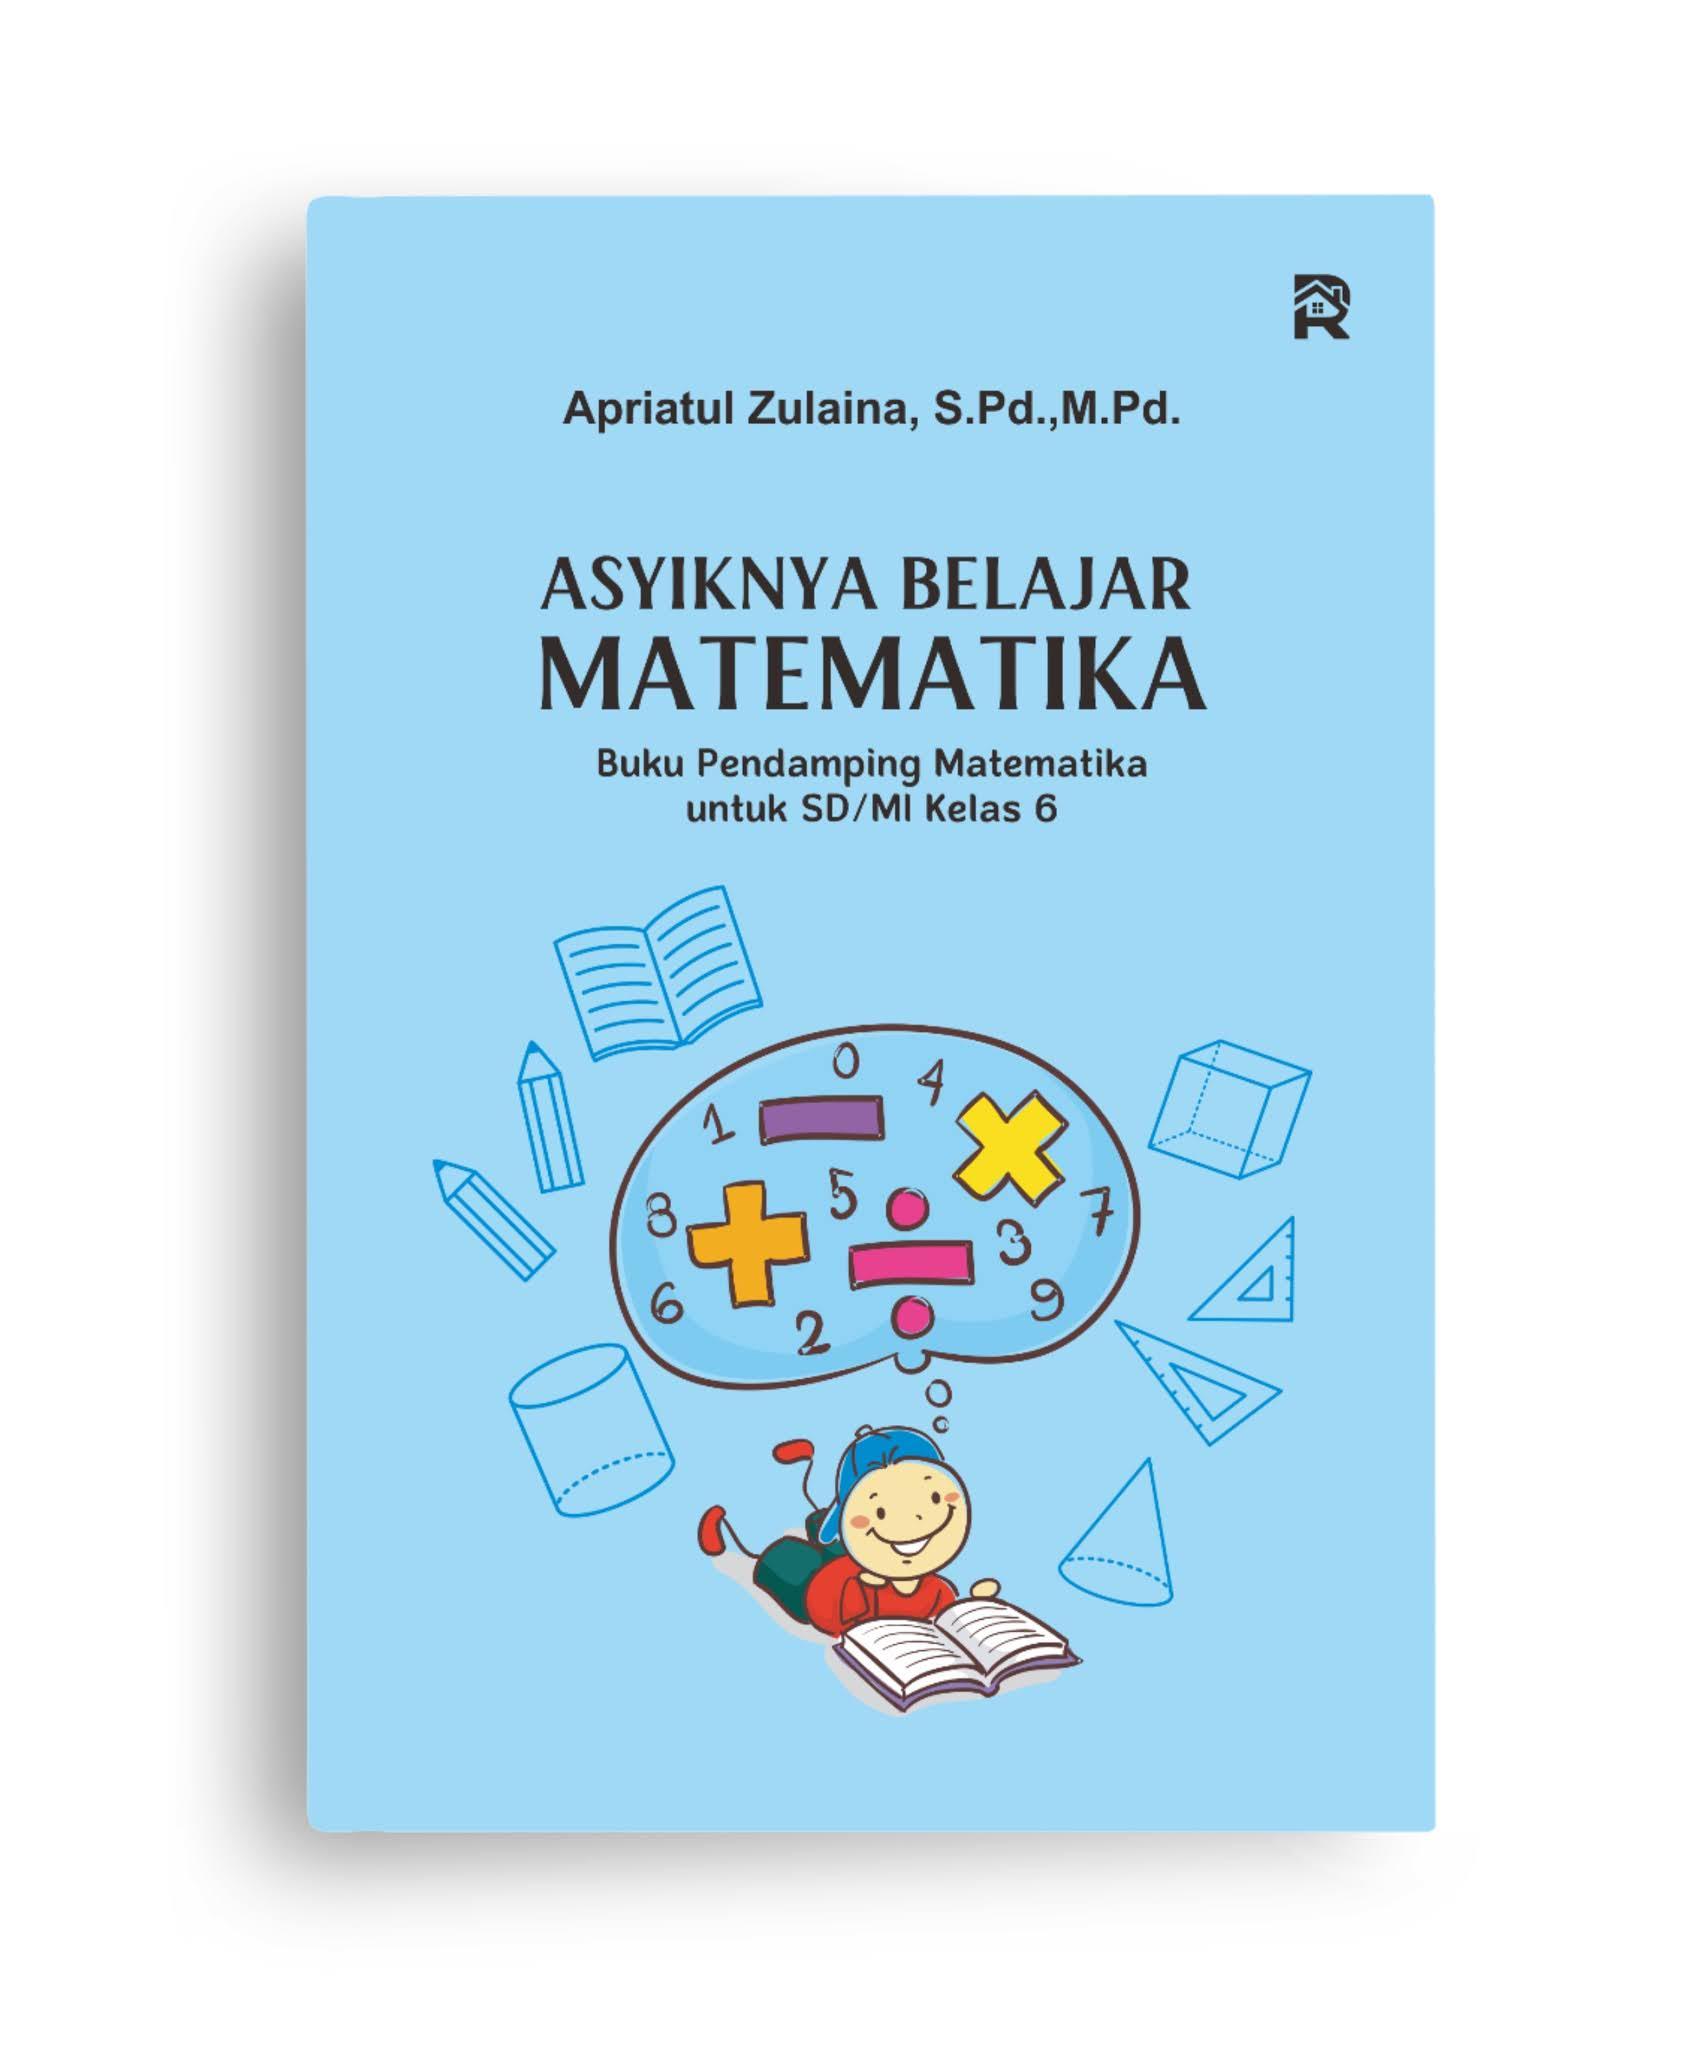 Asyiknya Belajar Matematika (Buku Pendamping Matematika SD/MI Kelas 6)